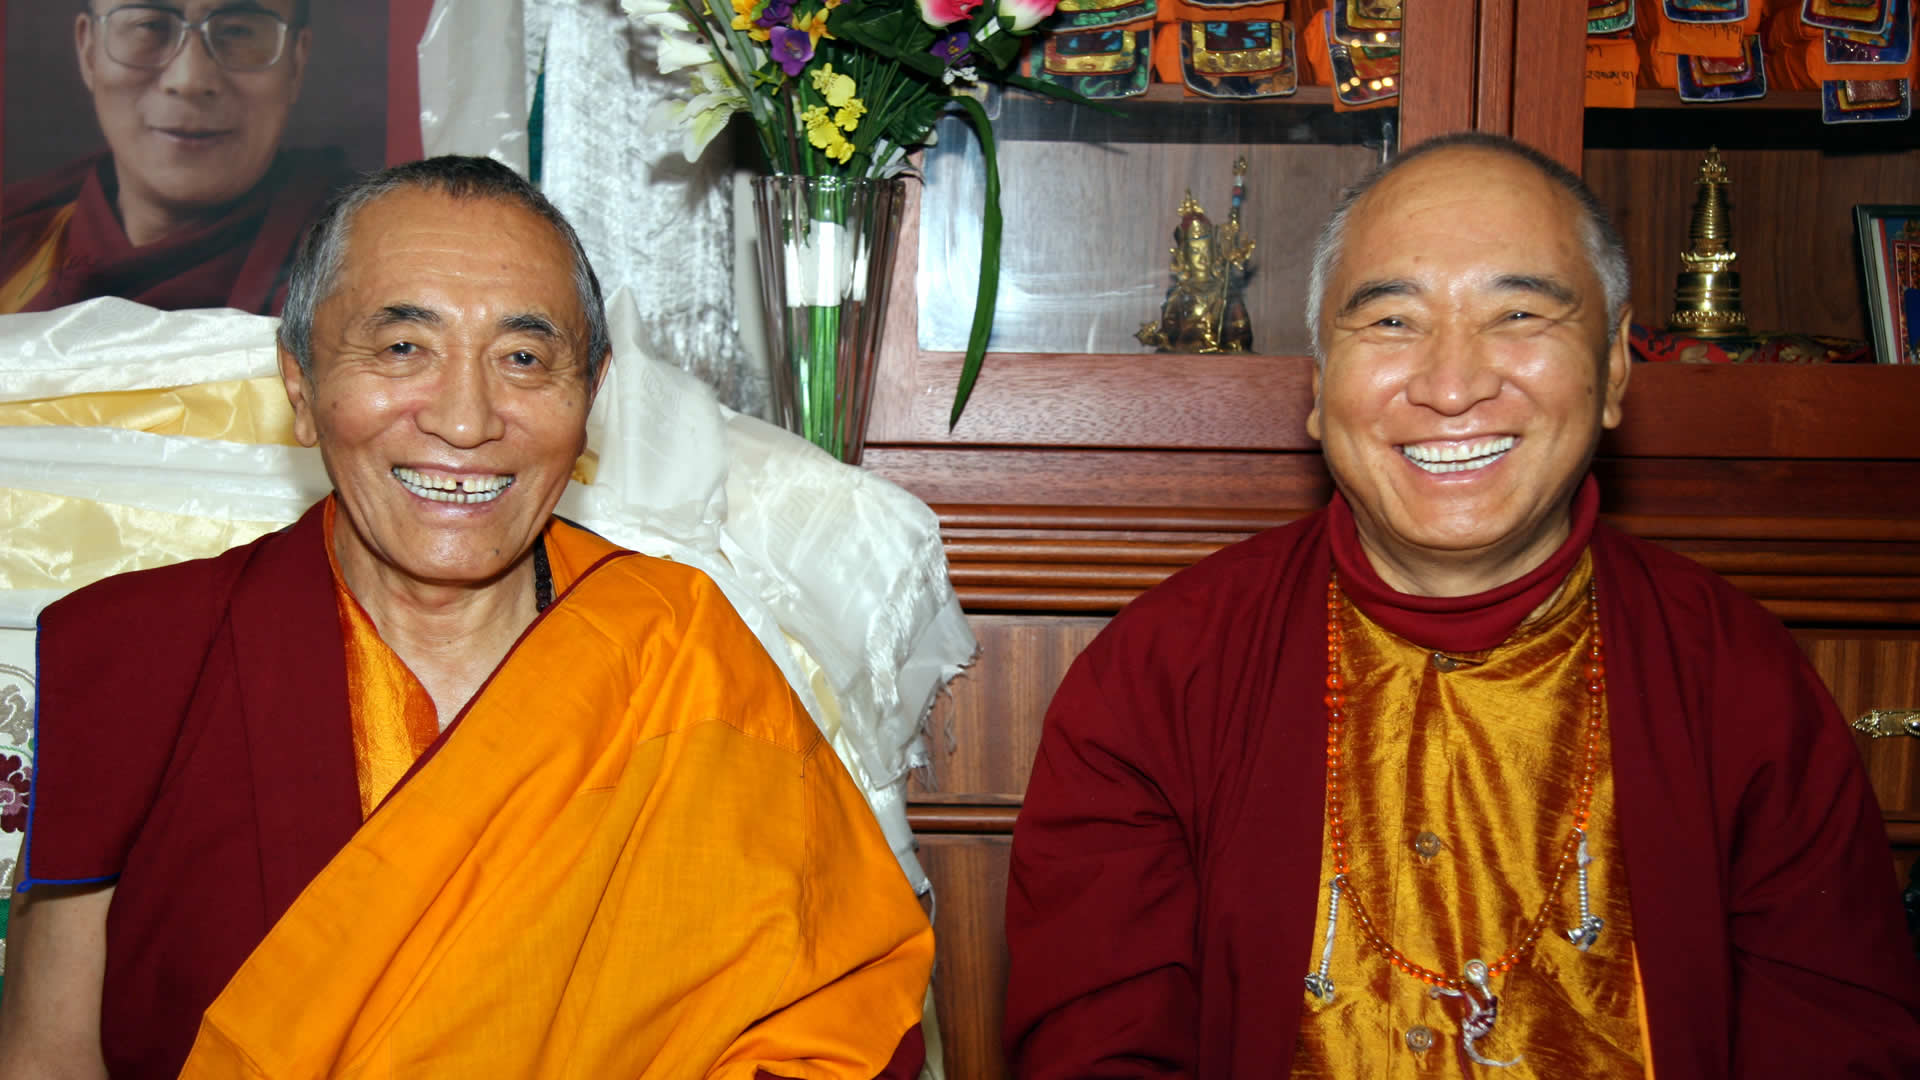 Venerable Khenpo Rinpoches